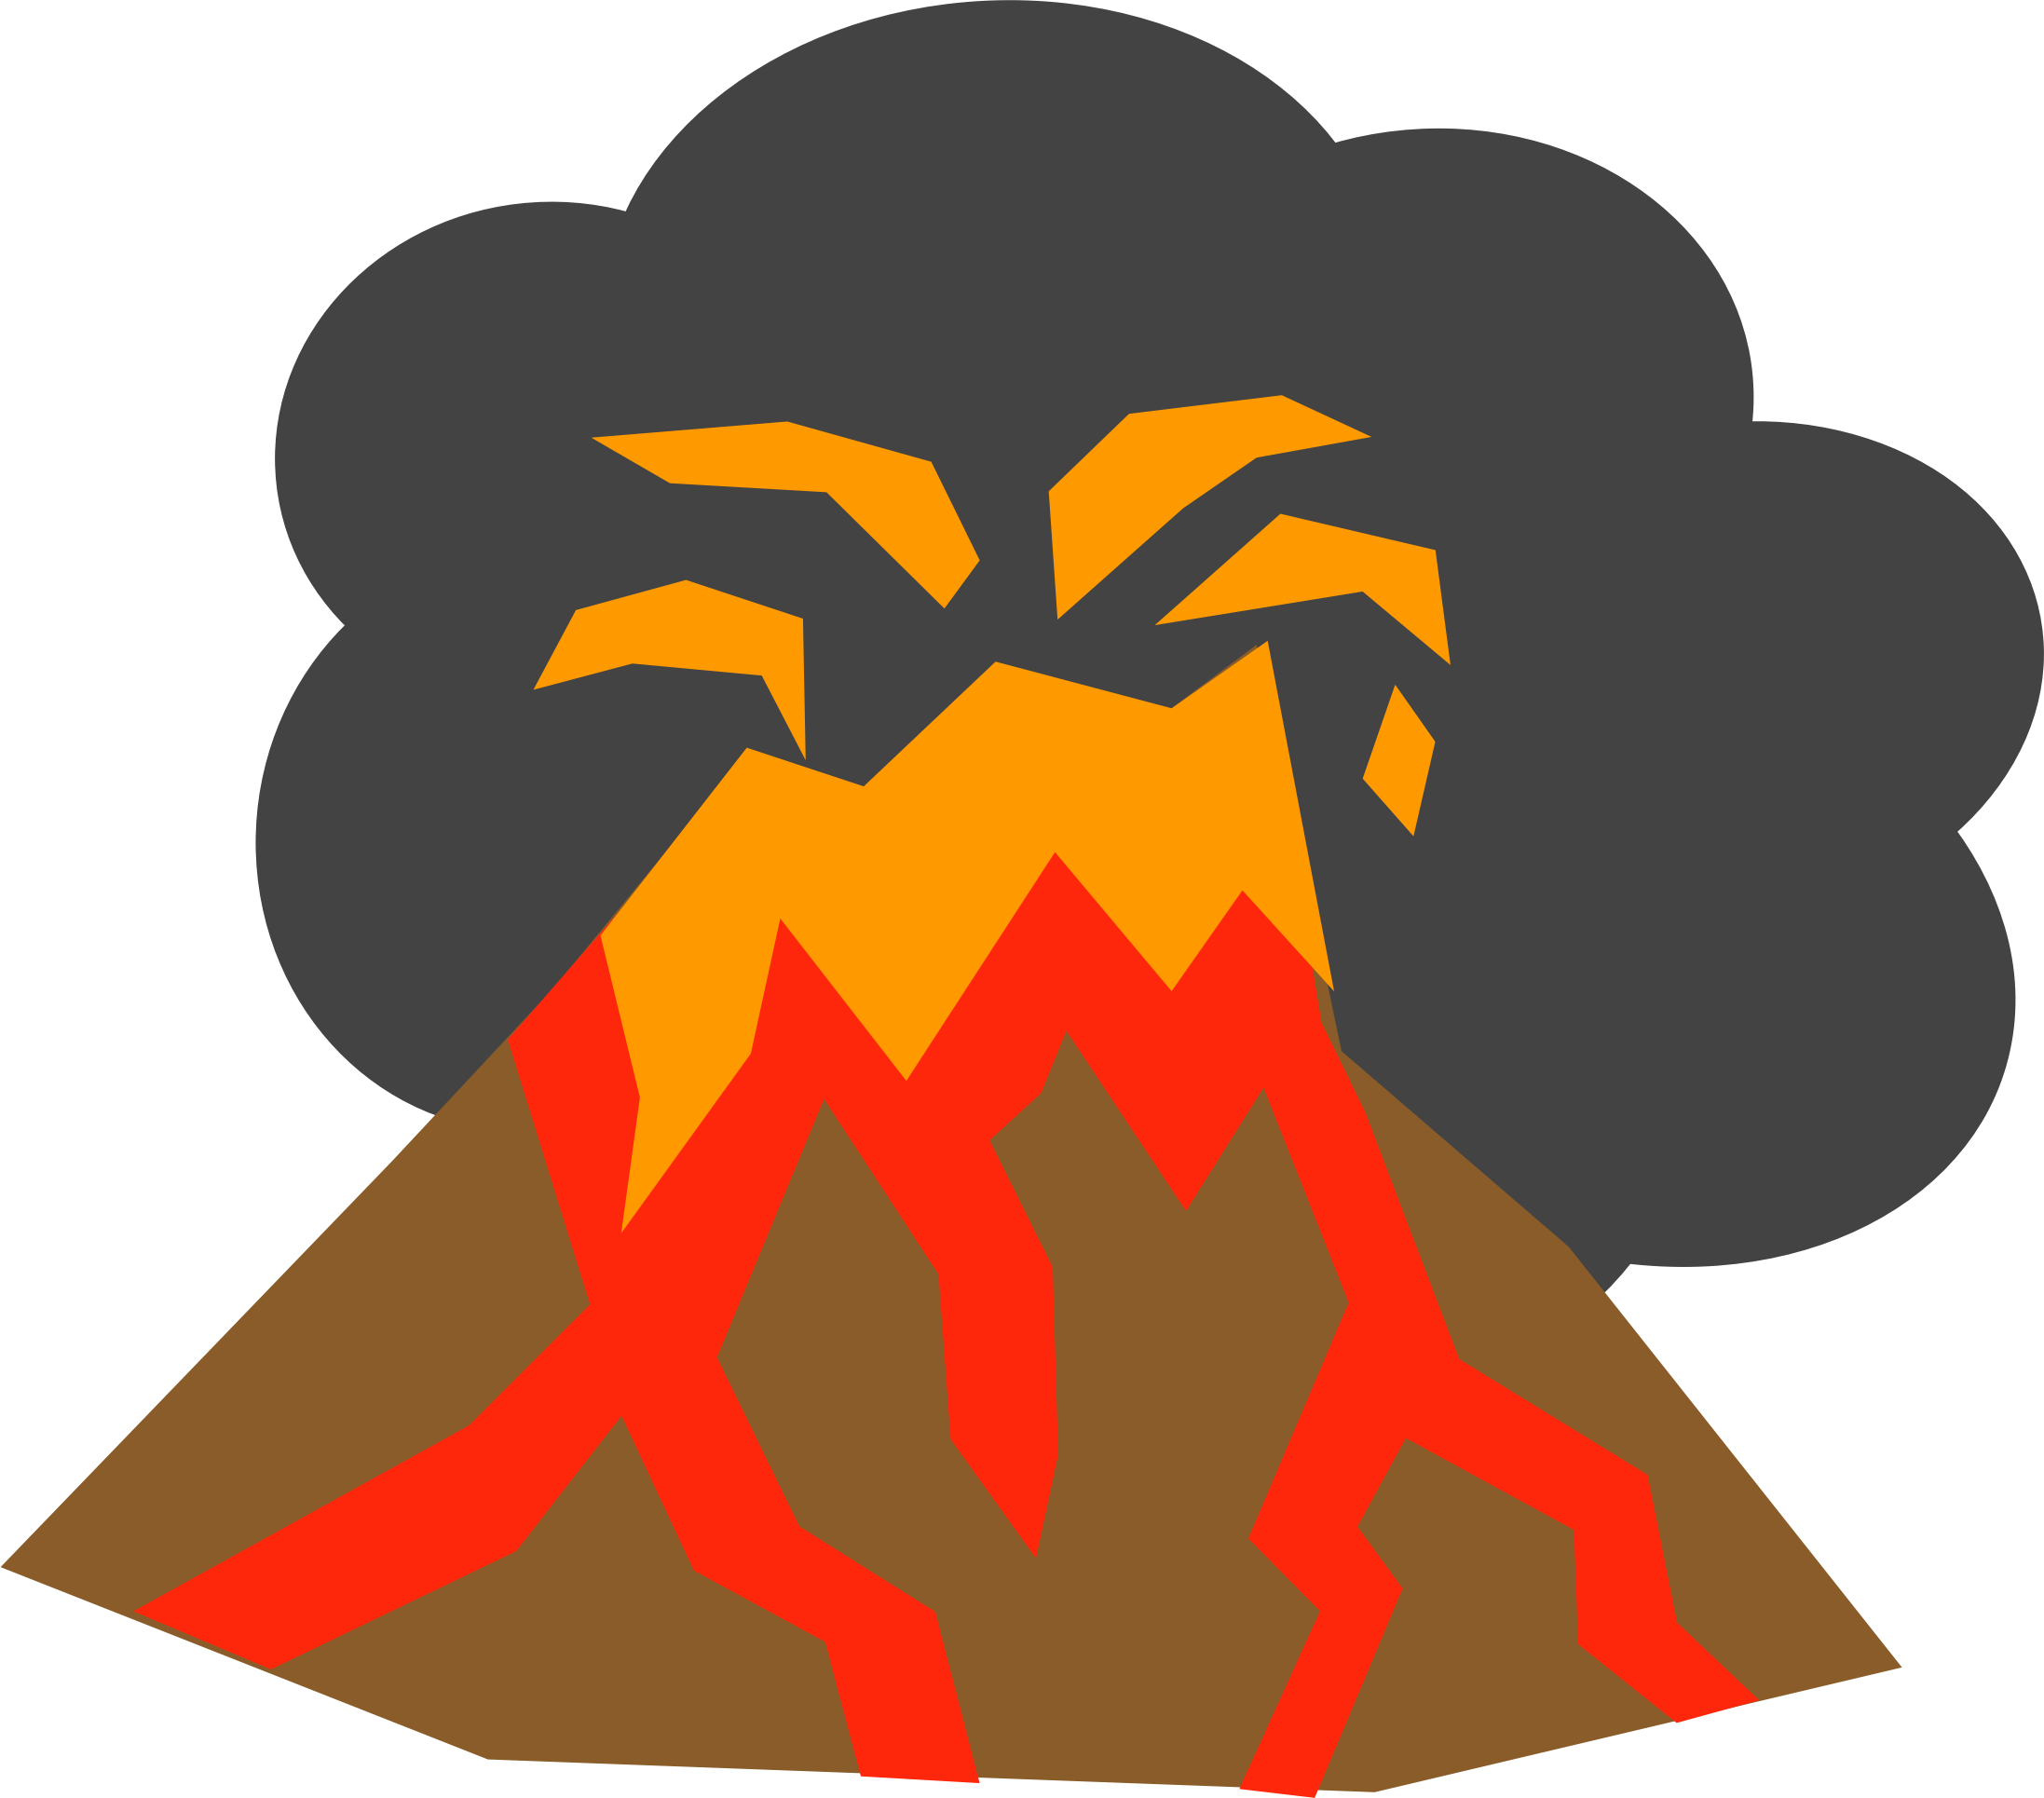 Scorpittarius clipart clip art freeuse download Volcano clipart - 150 transparent clip arts, images and ... clip art freeuse download